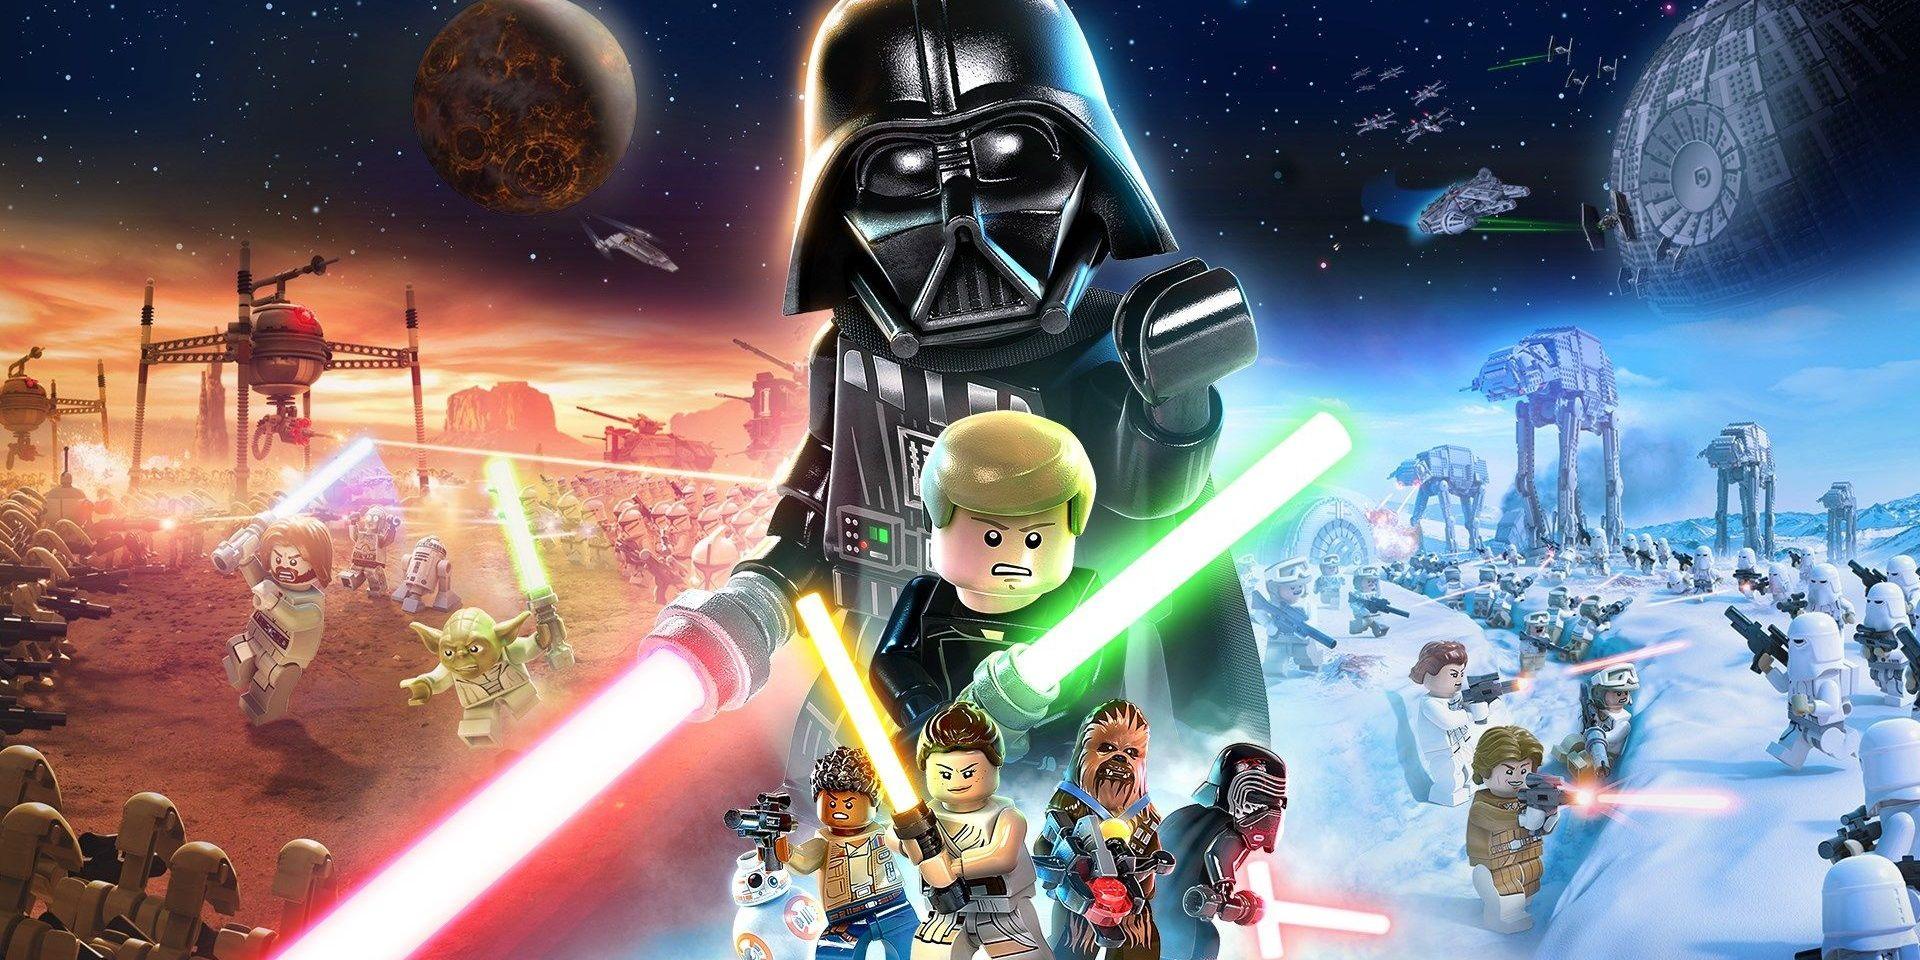 LEGO Skywalker Saga: All LEGO Star Wars Games So Far (Ranked By GameSpot  Score)